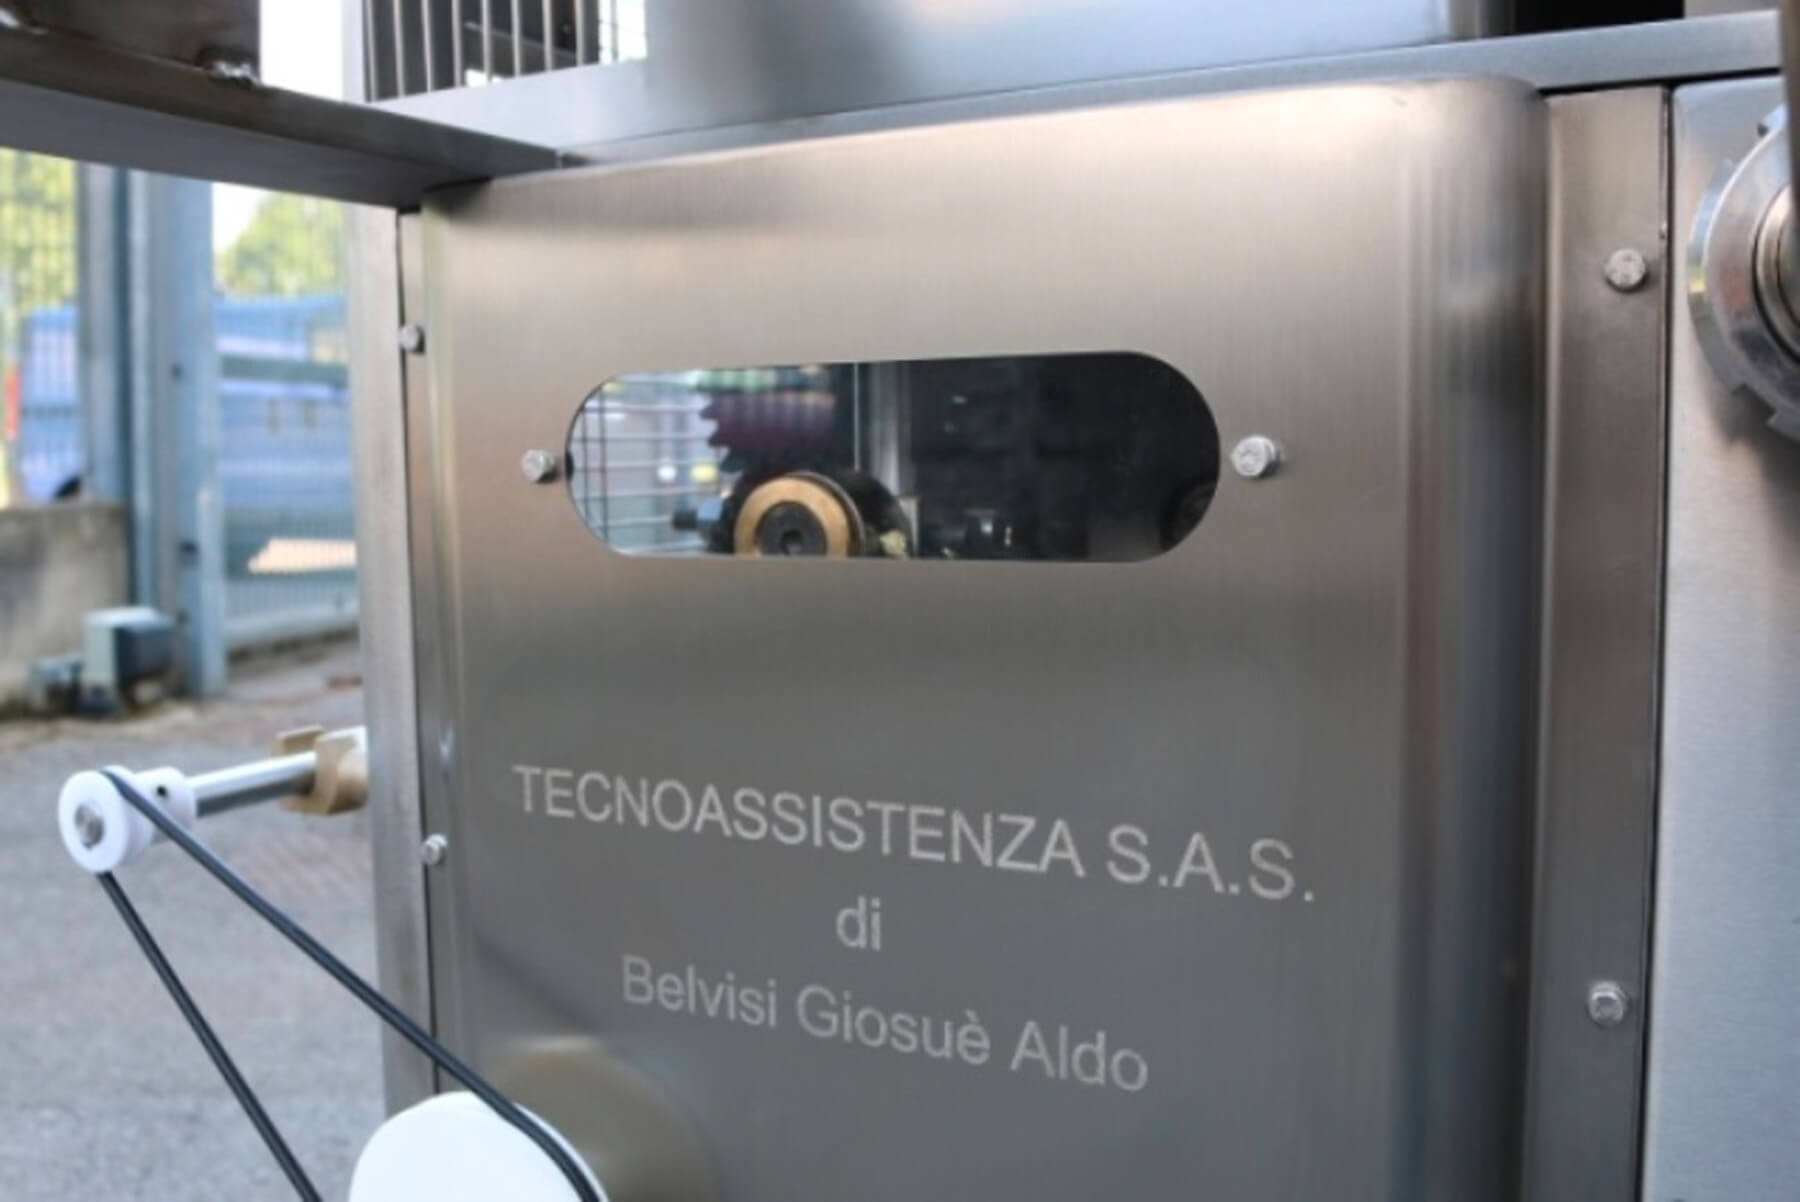 DOUBLE SHEET RAVIOLI FORMING MACHINE model TECNOASSISTENZA 250